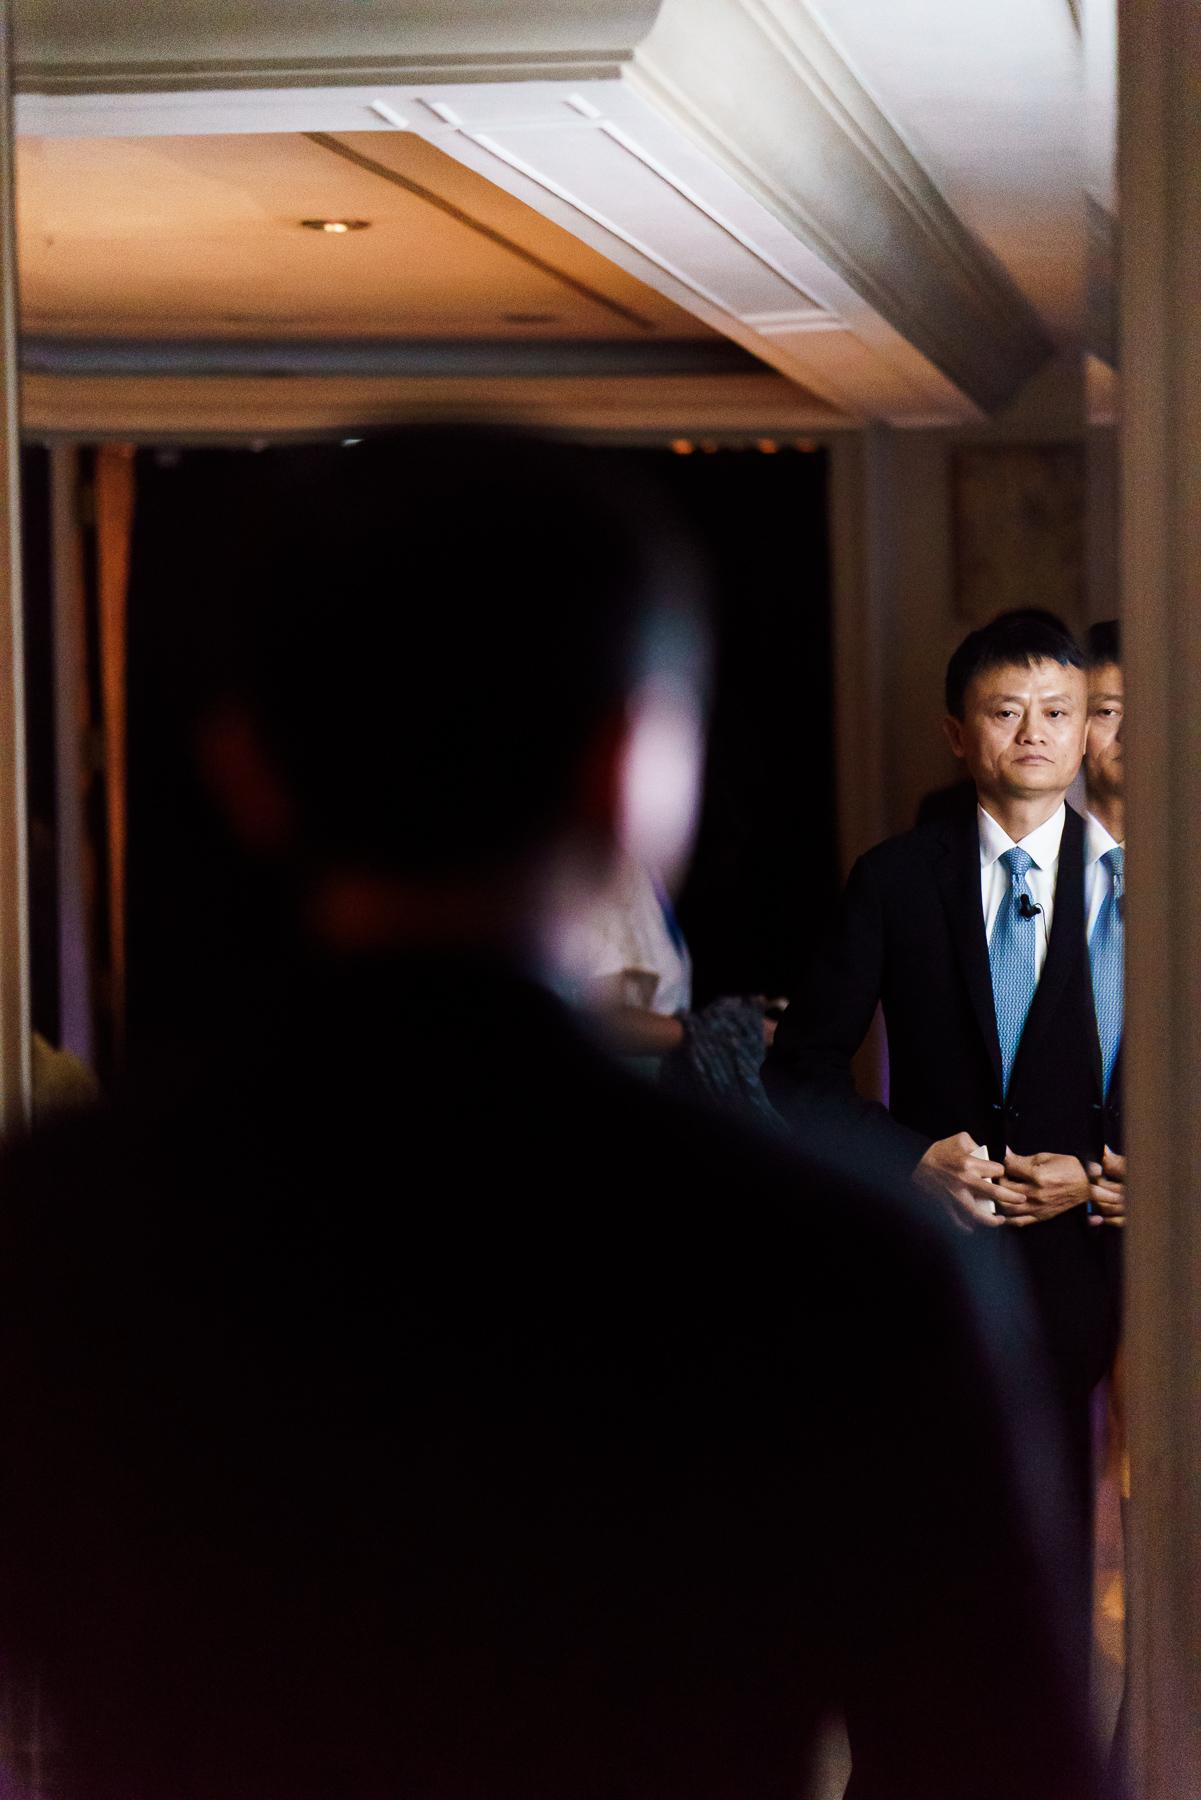 Jack Ma, richest man in China, November 2015.